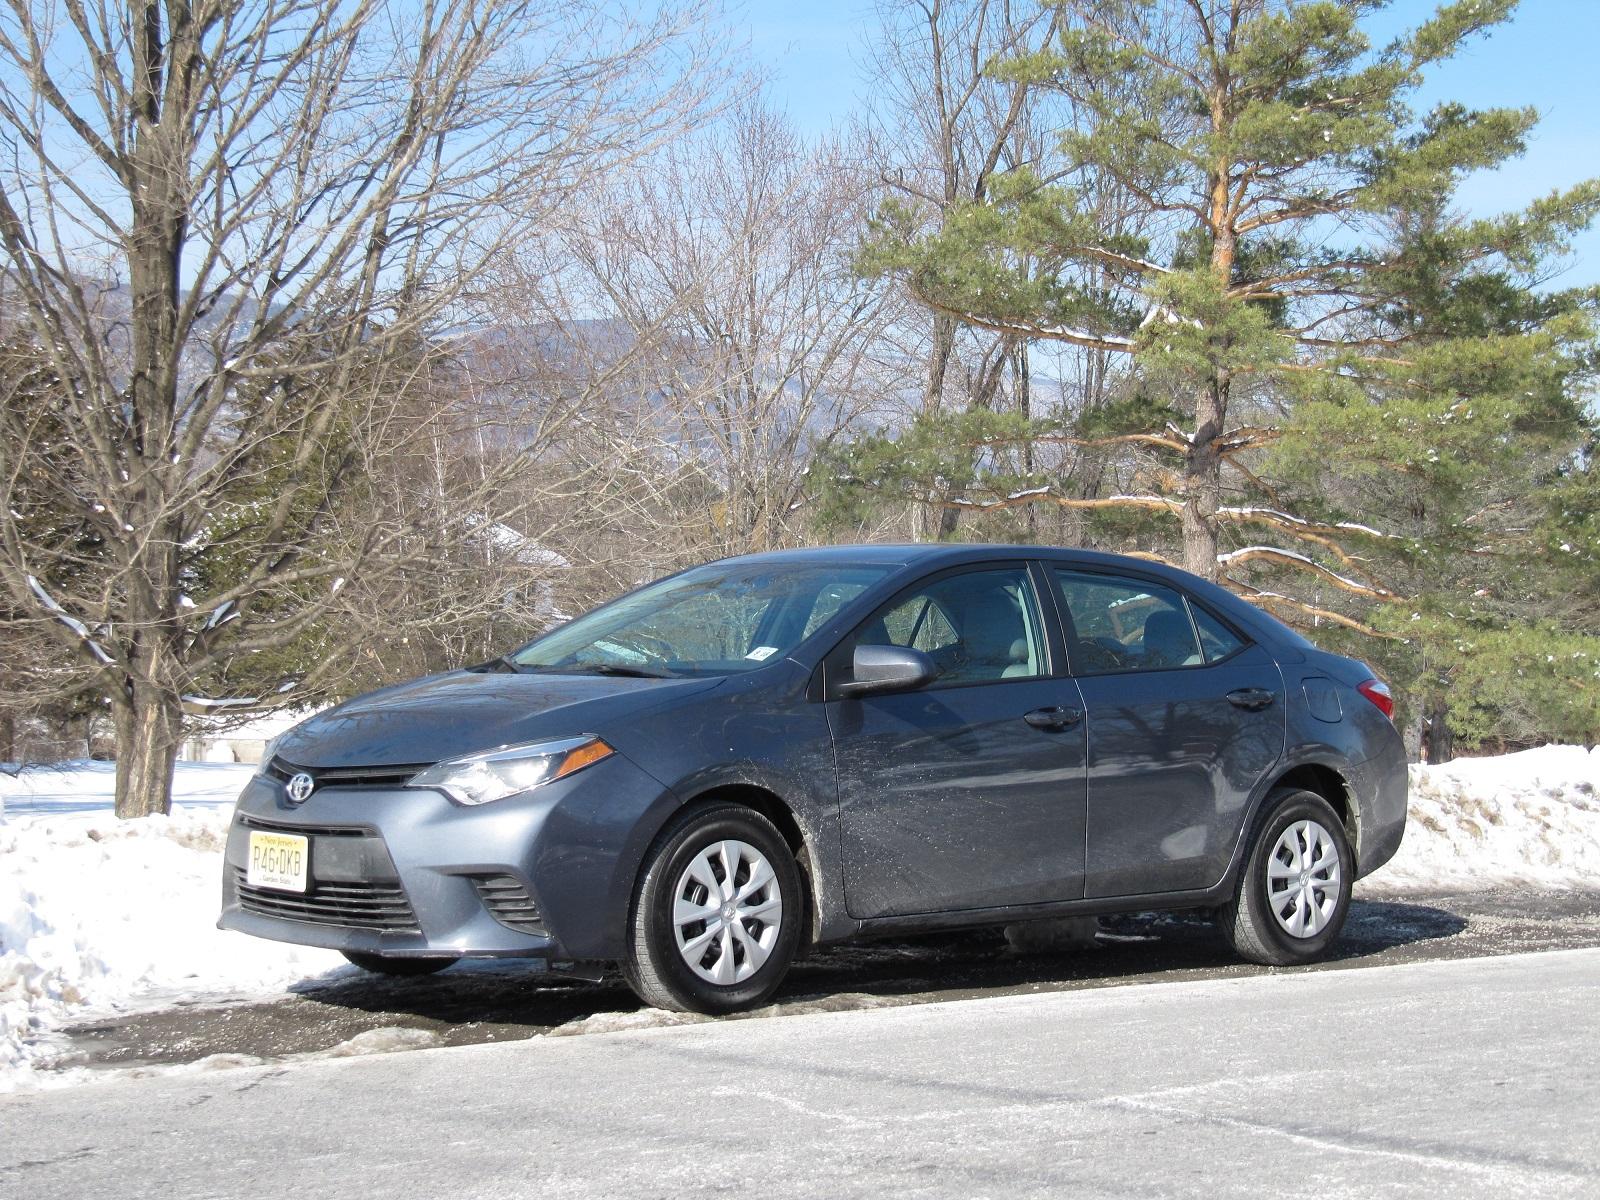 2014 Toyota Corolla Eco Le Gas Mileage Test Drive